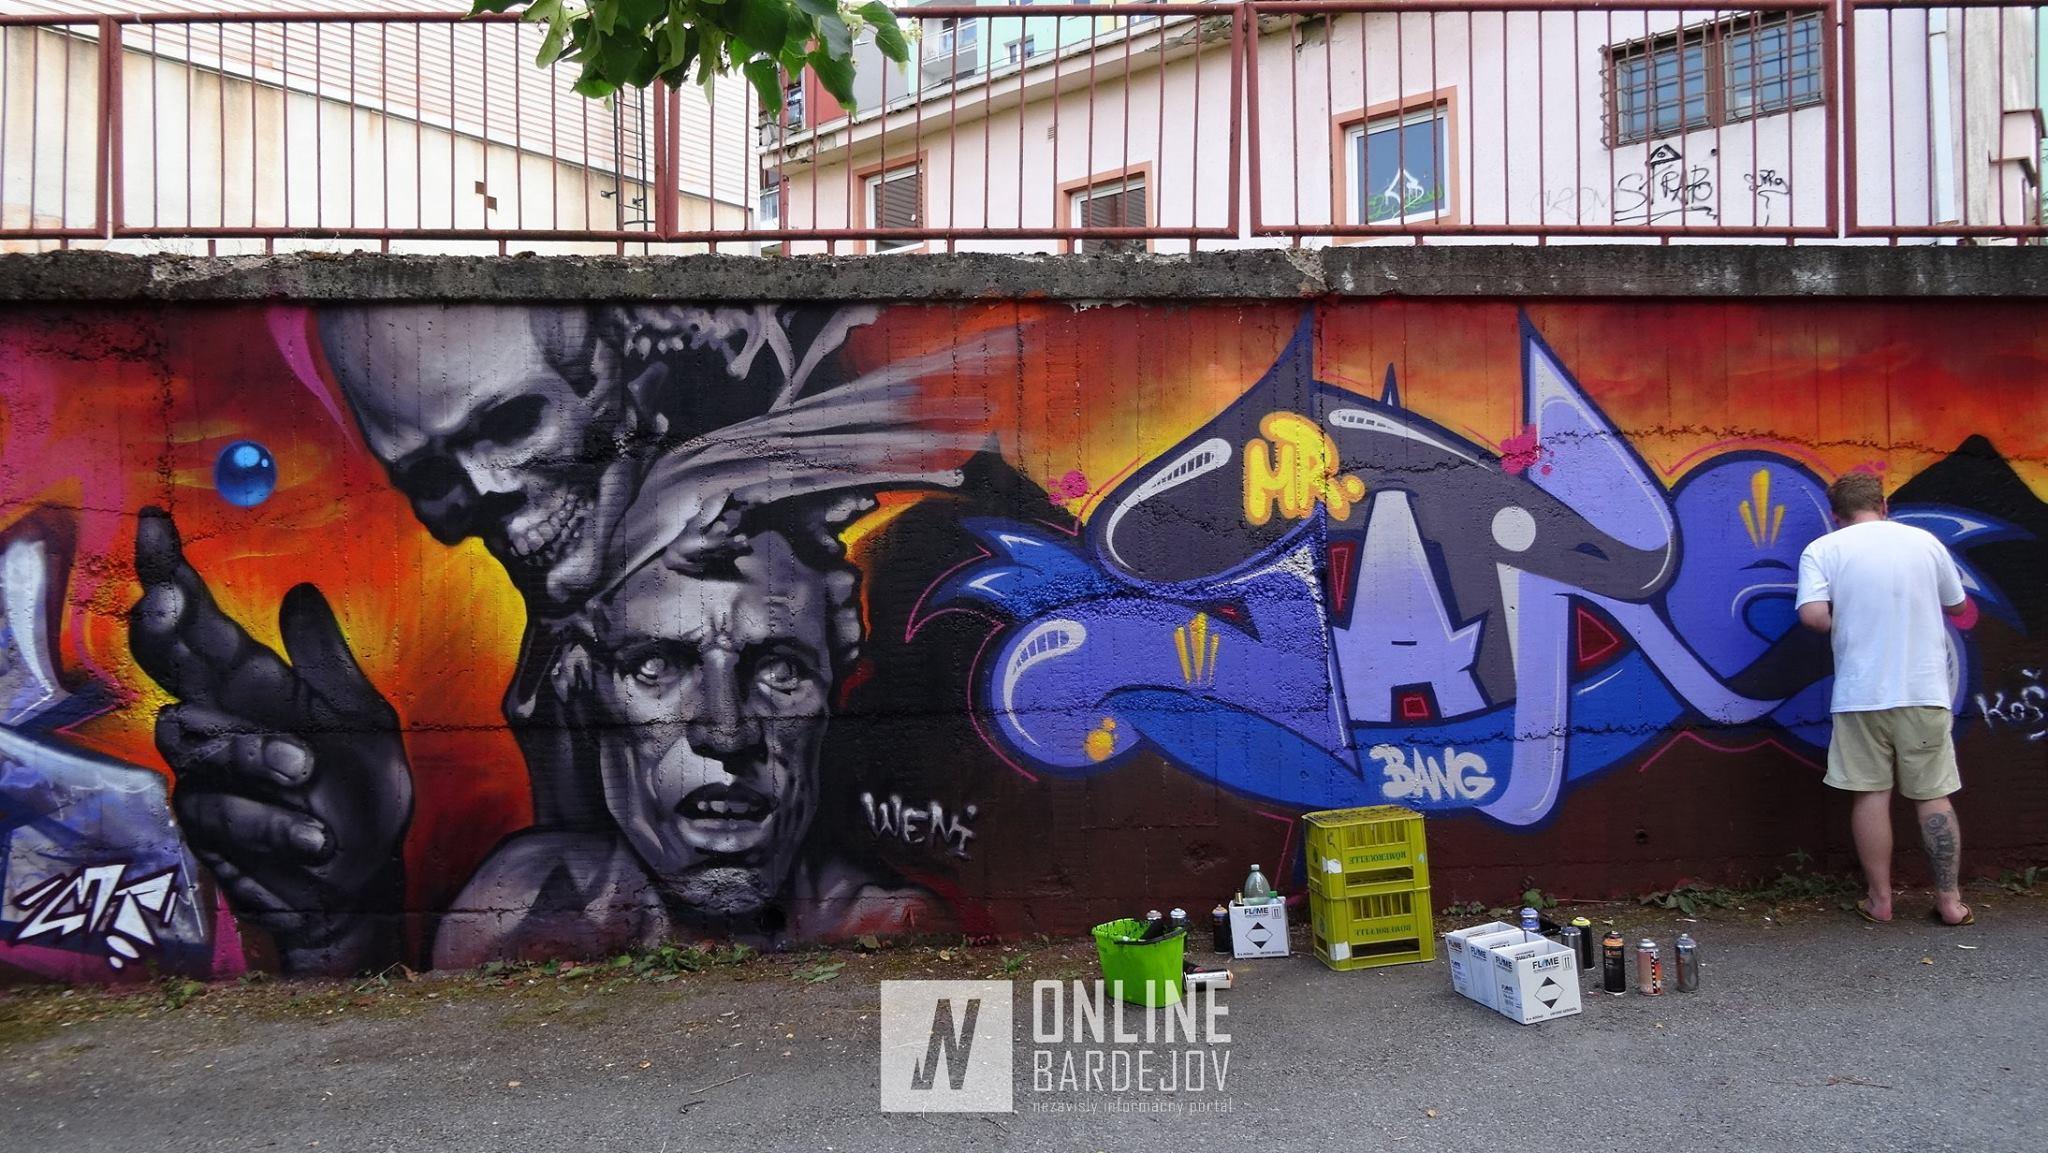 Street artové sympózium mesta Bardejov vol. 5